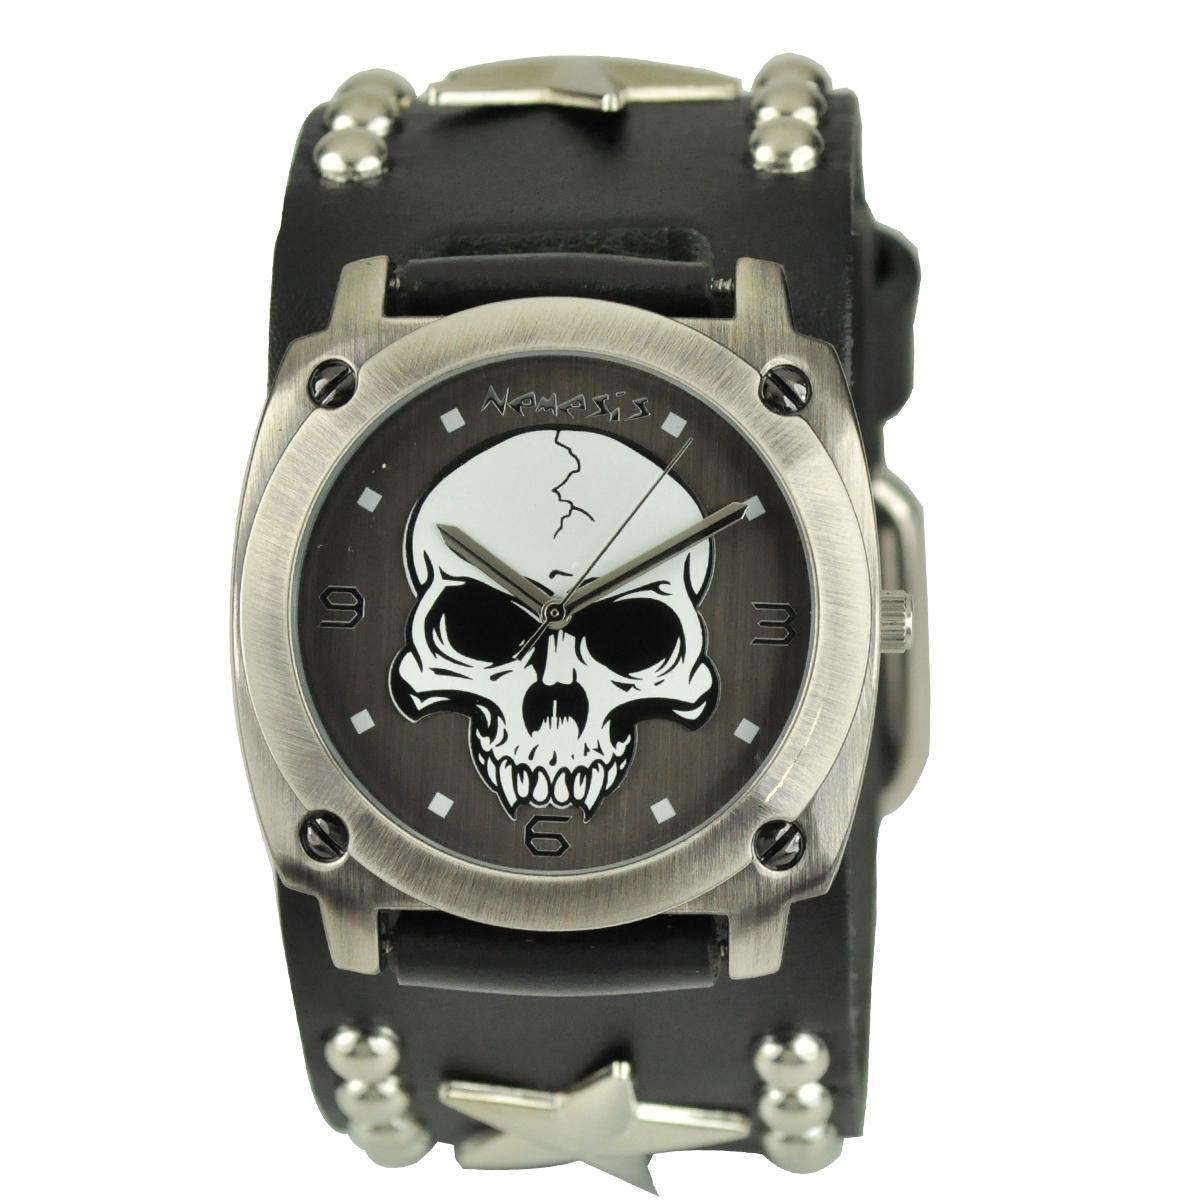 Nemesis Men's Punk Rock Star Skull Leather Band Watch